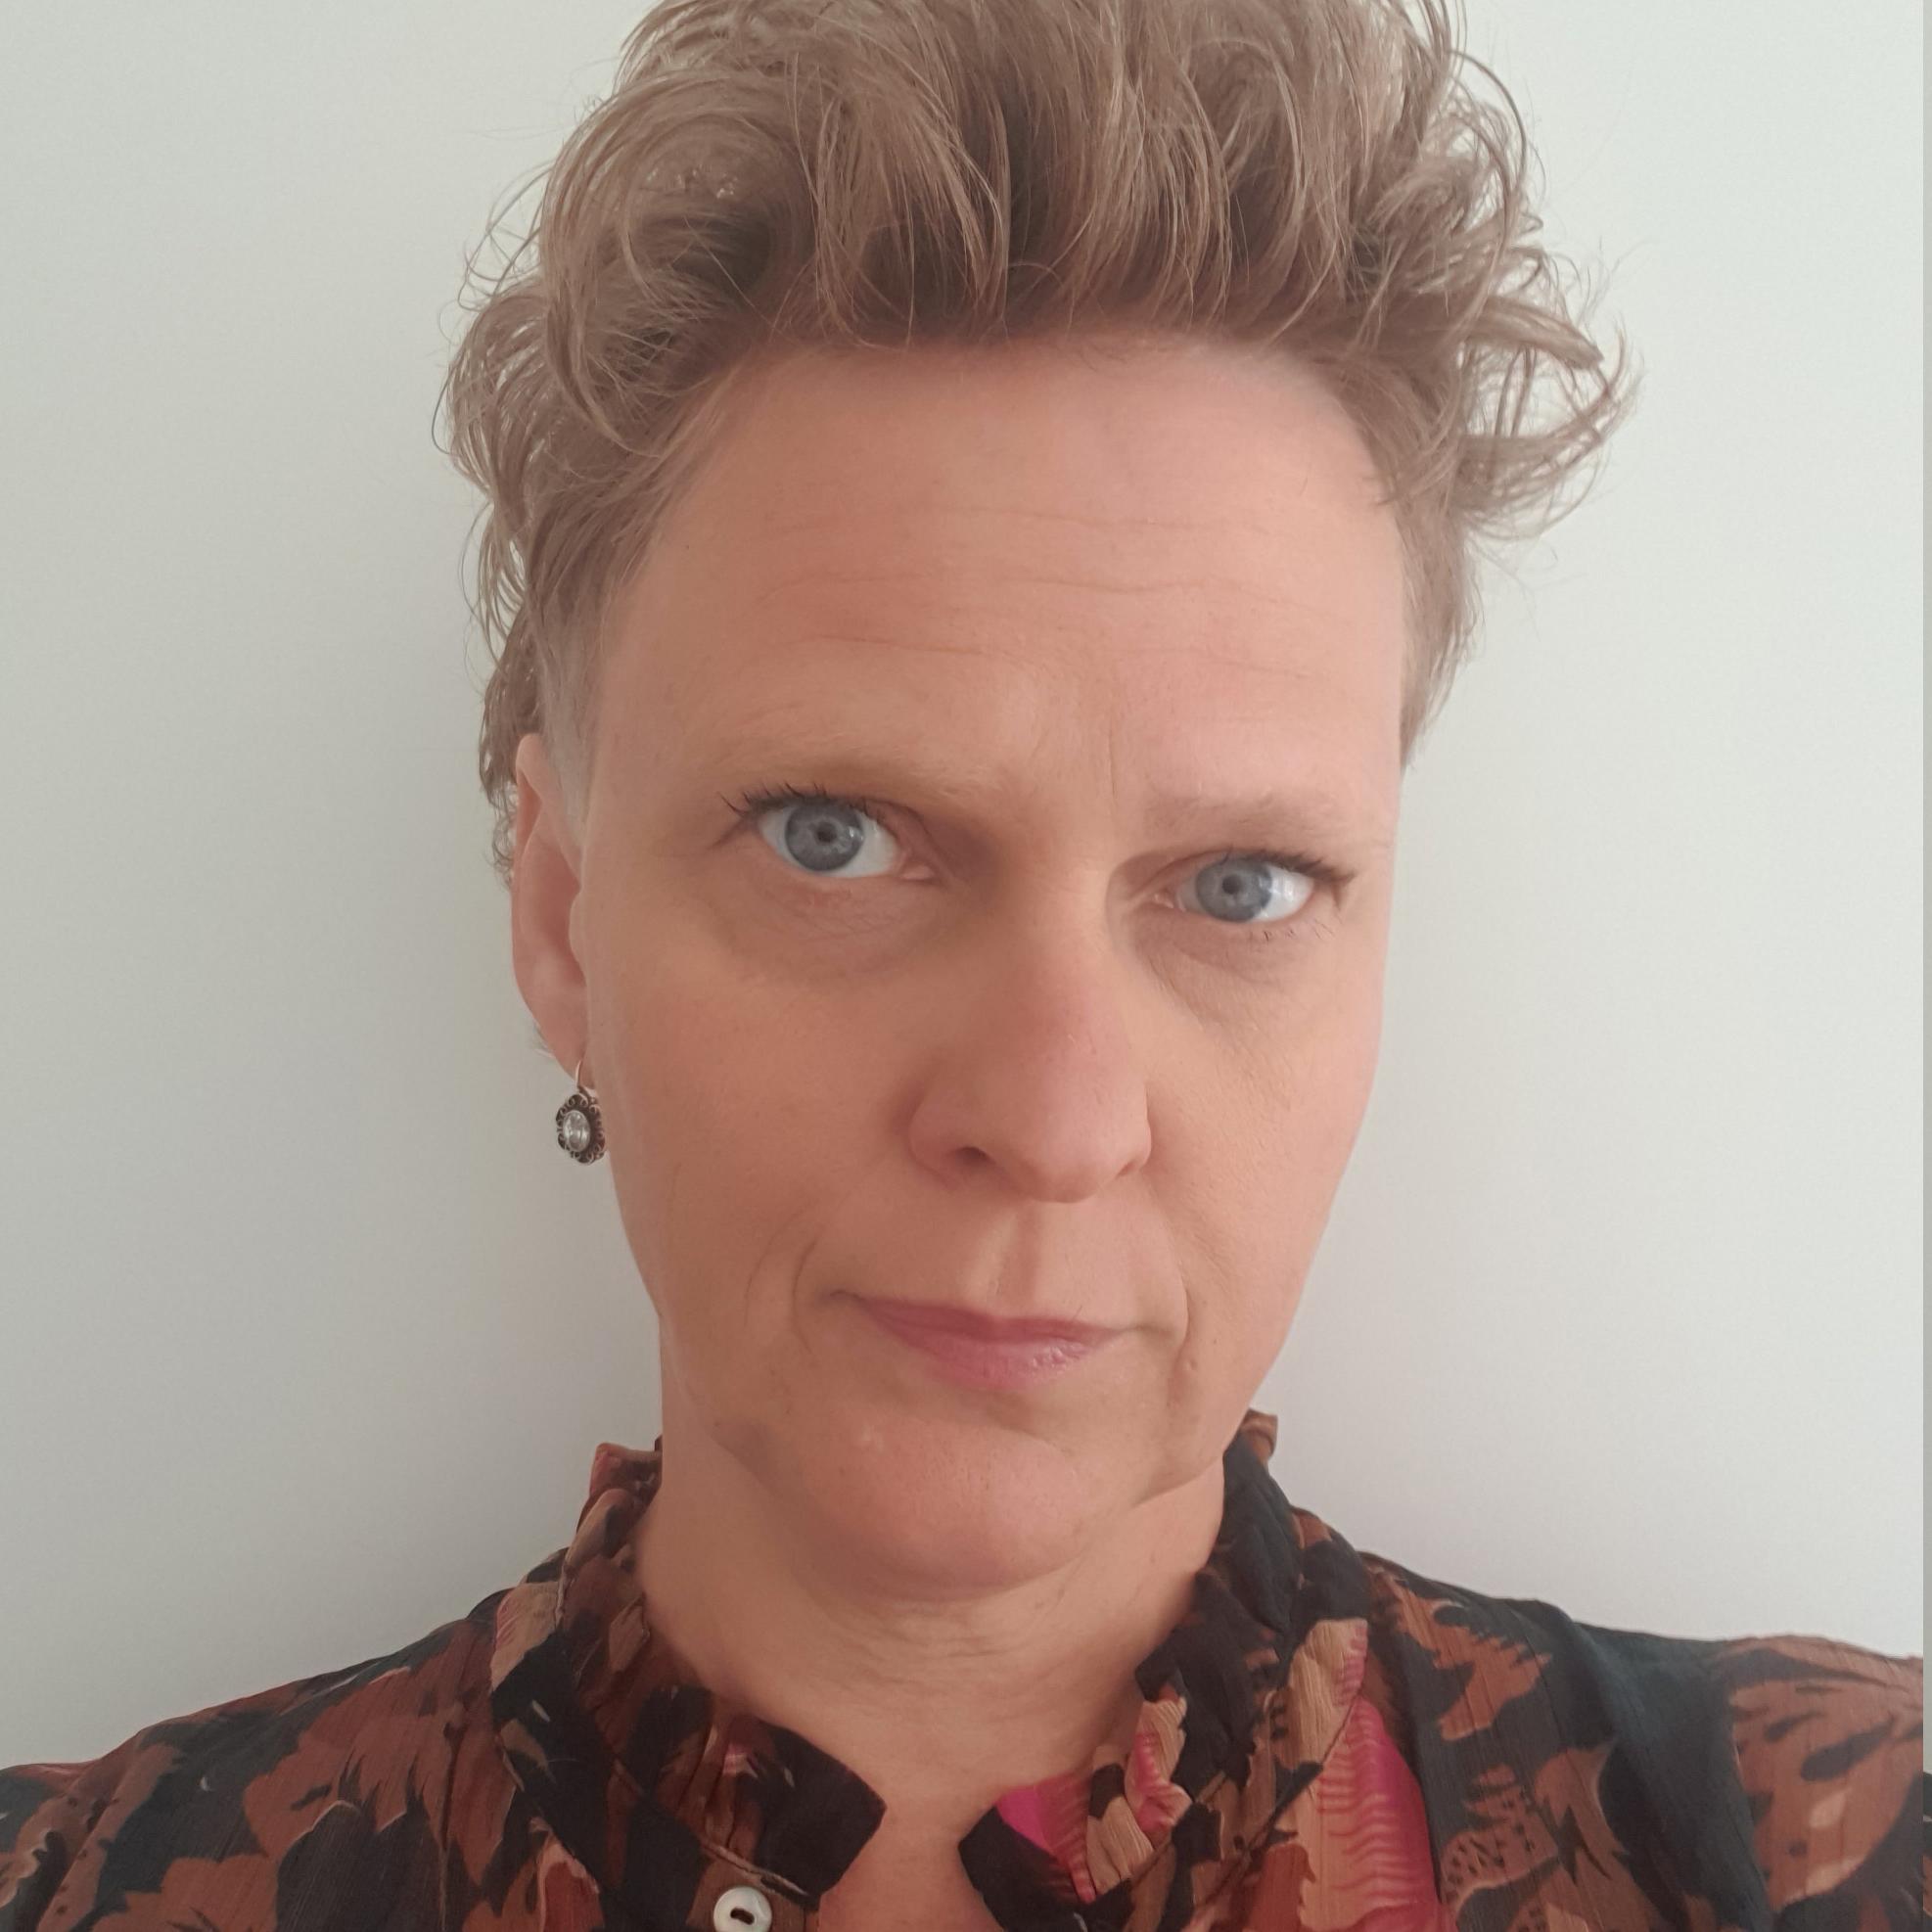 Adjunk Professor - Syddansk universitet